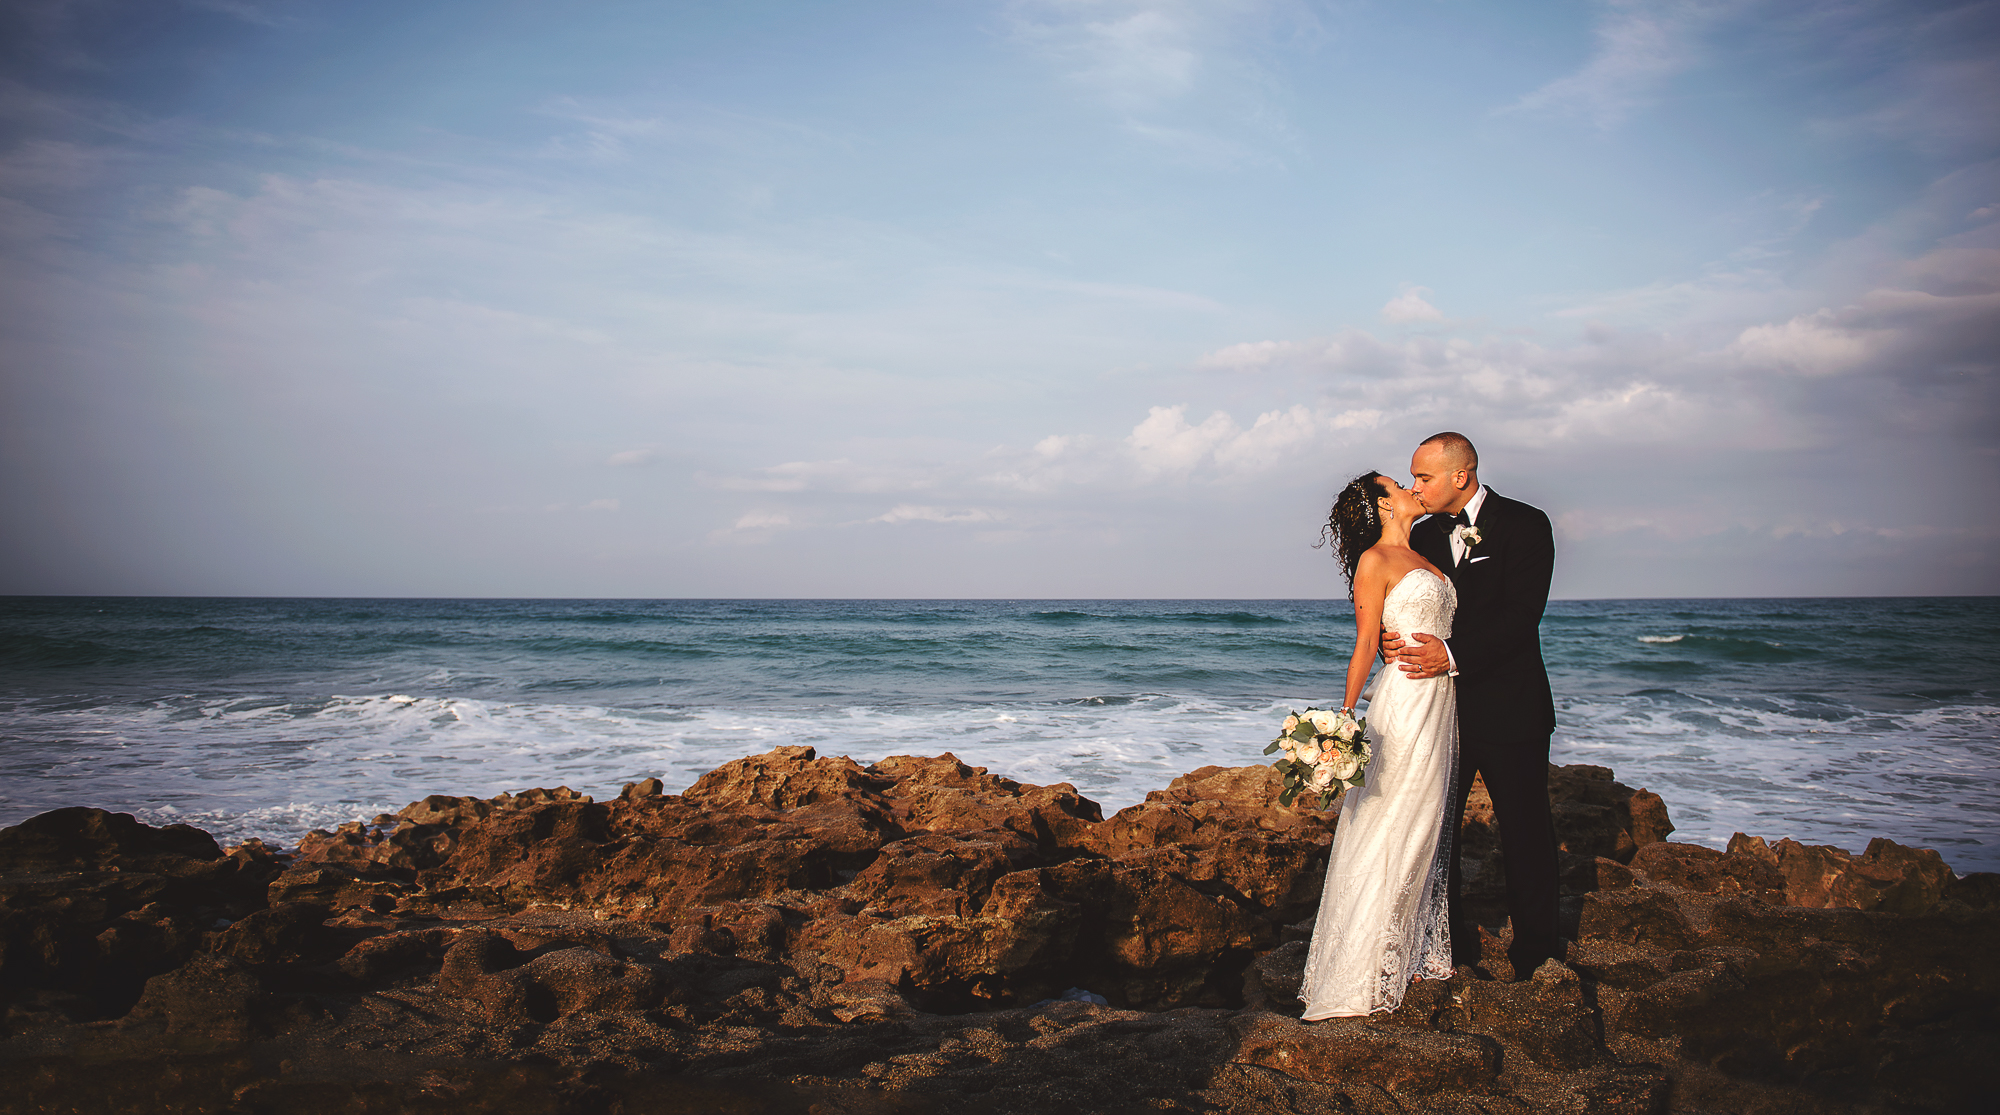 boston wedding photographer juipter florida